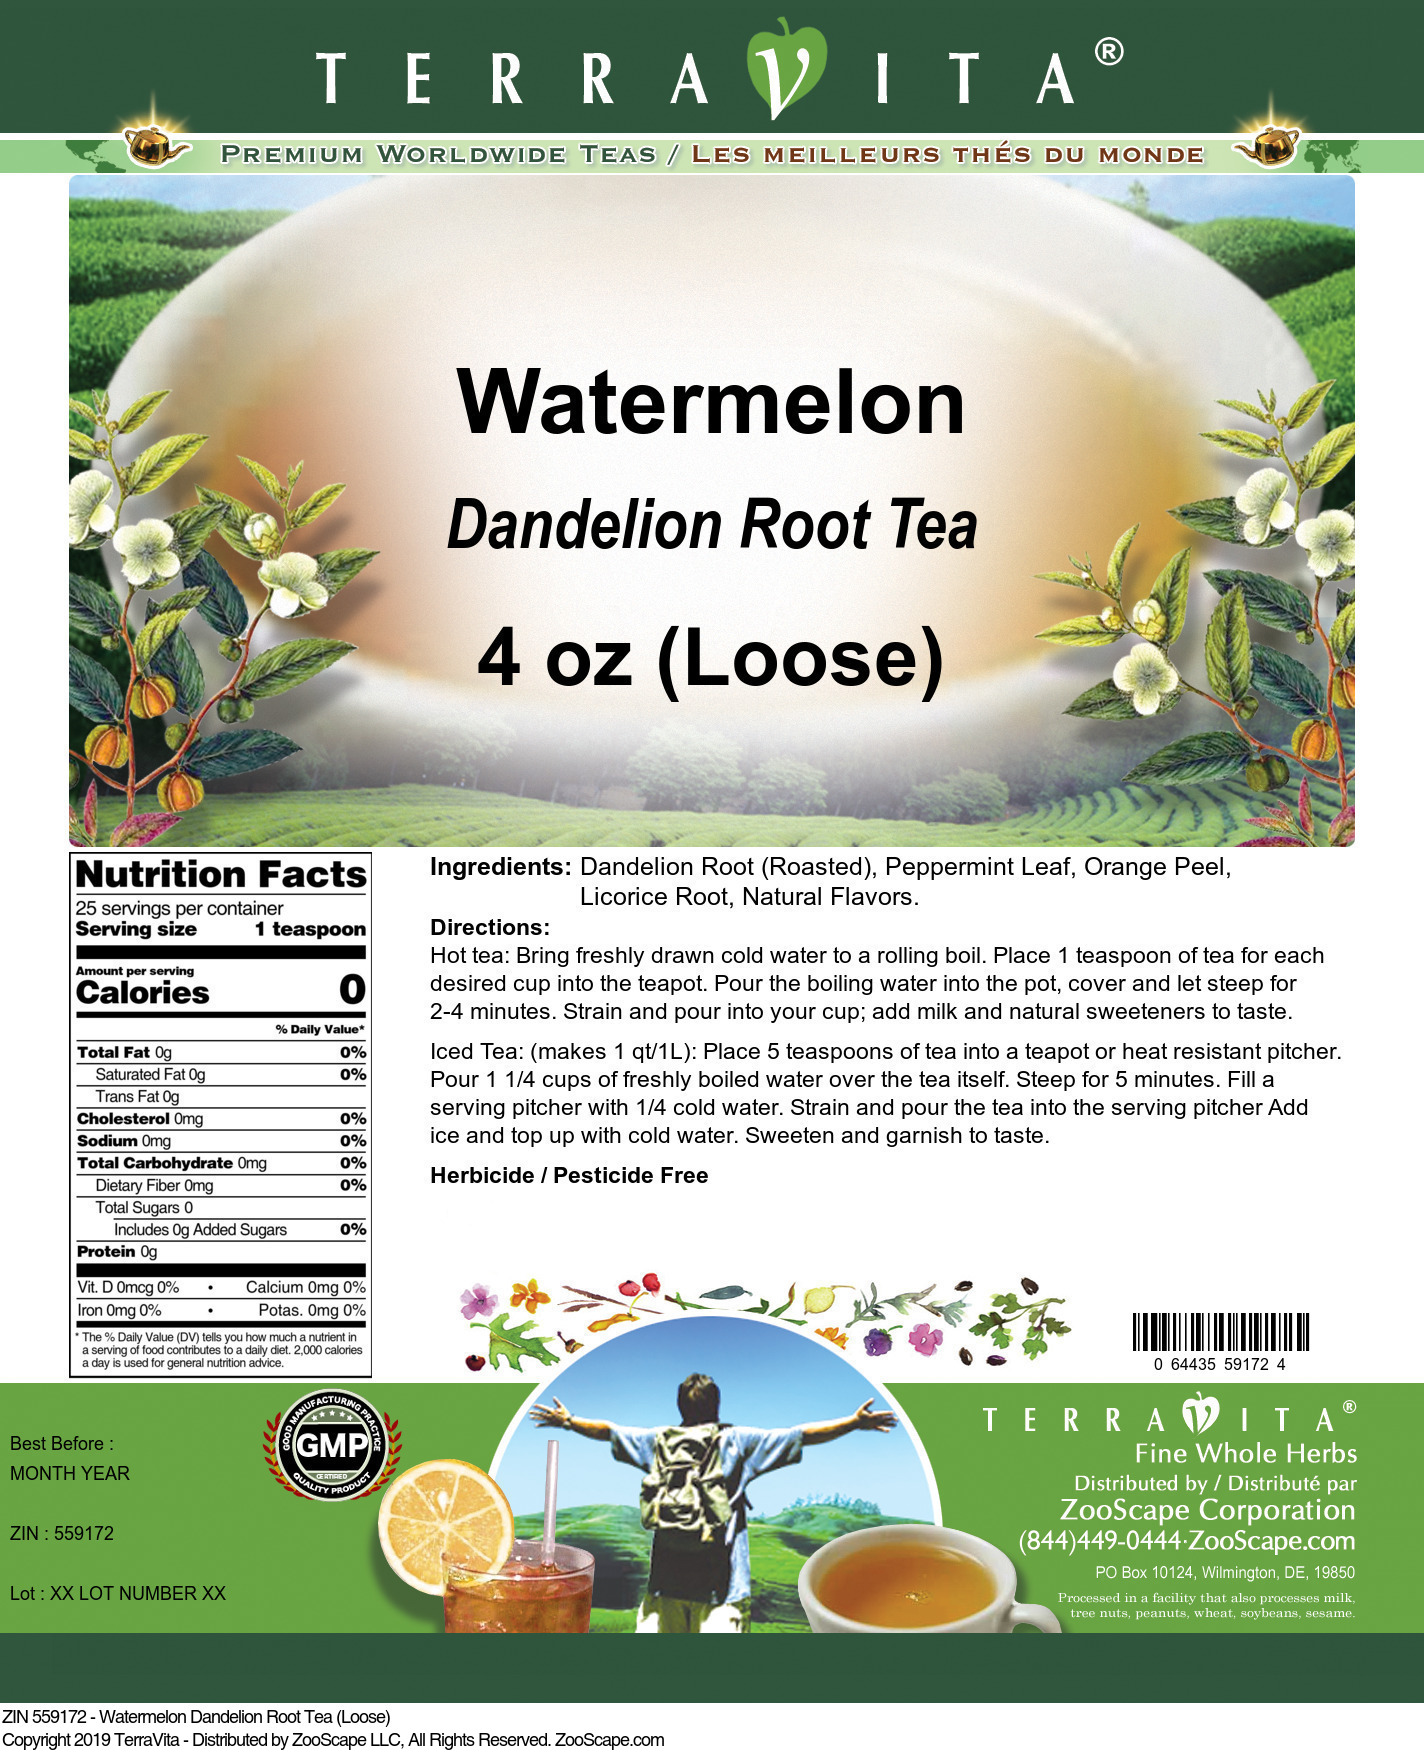 Watermelon Dandelion Root Tea (Loose)